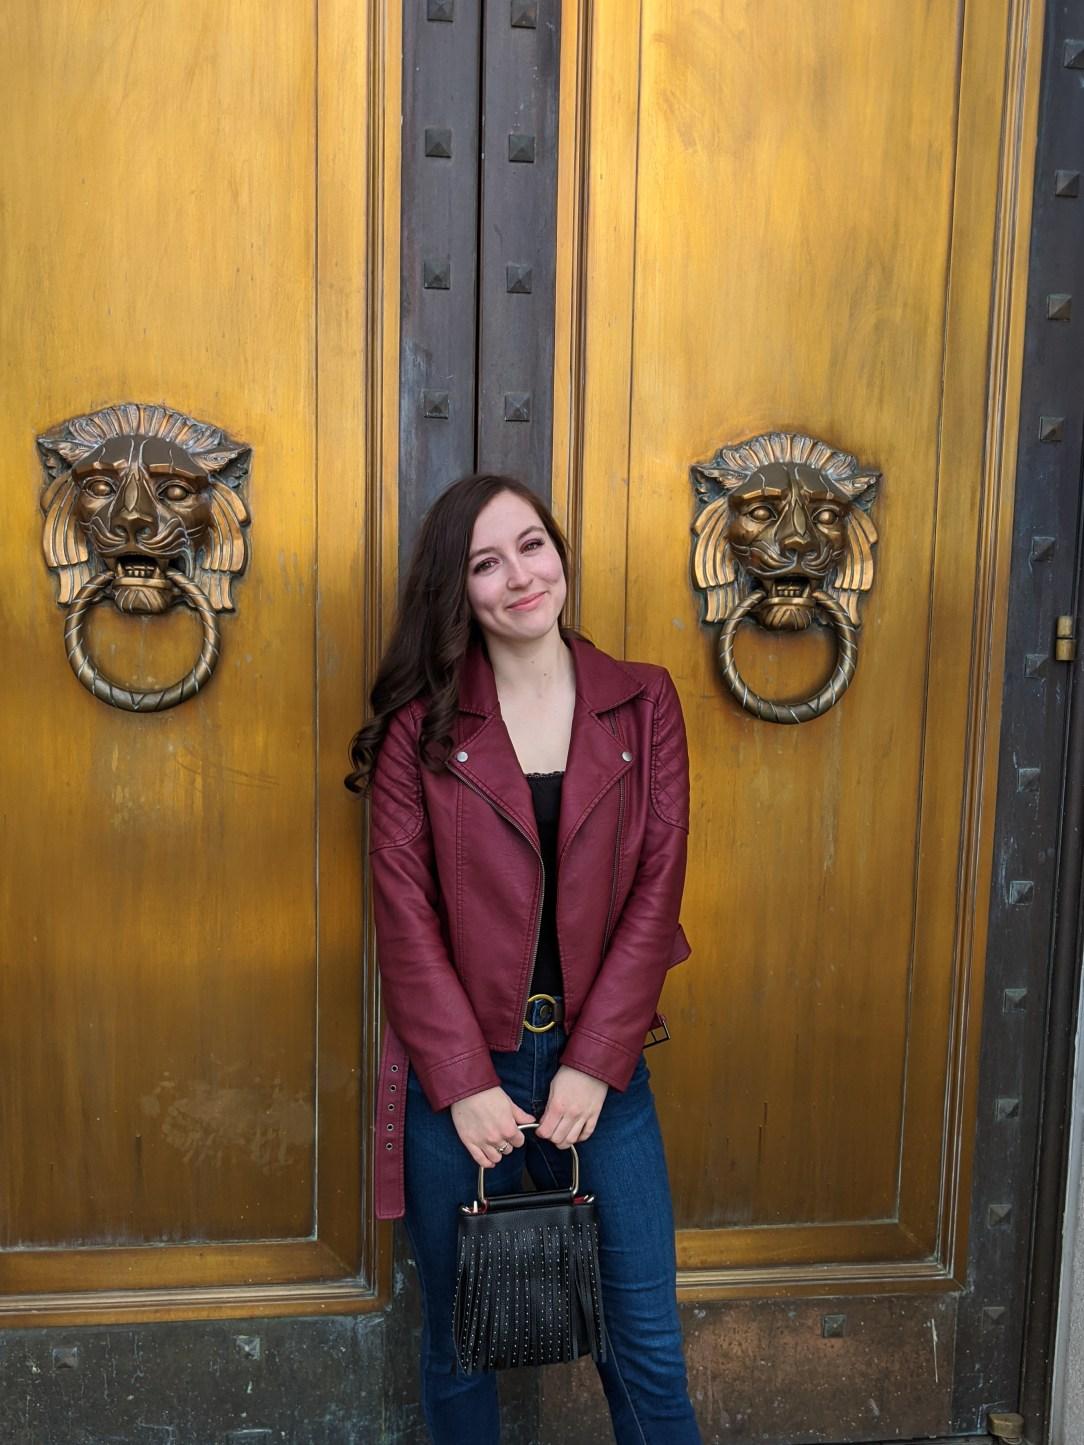 Denver Fashion Week, model casting call, burgundy moto jacket